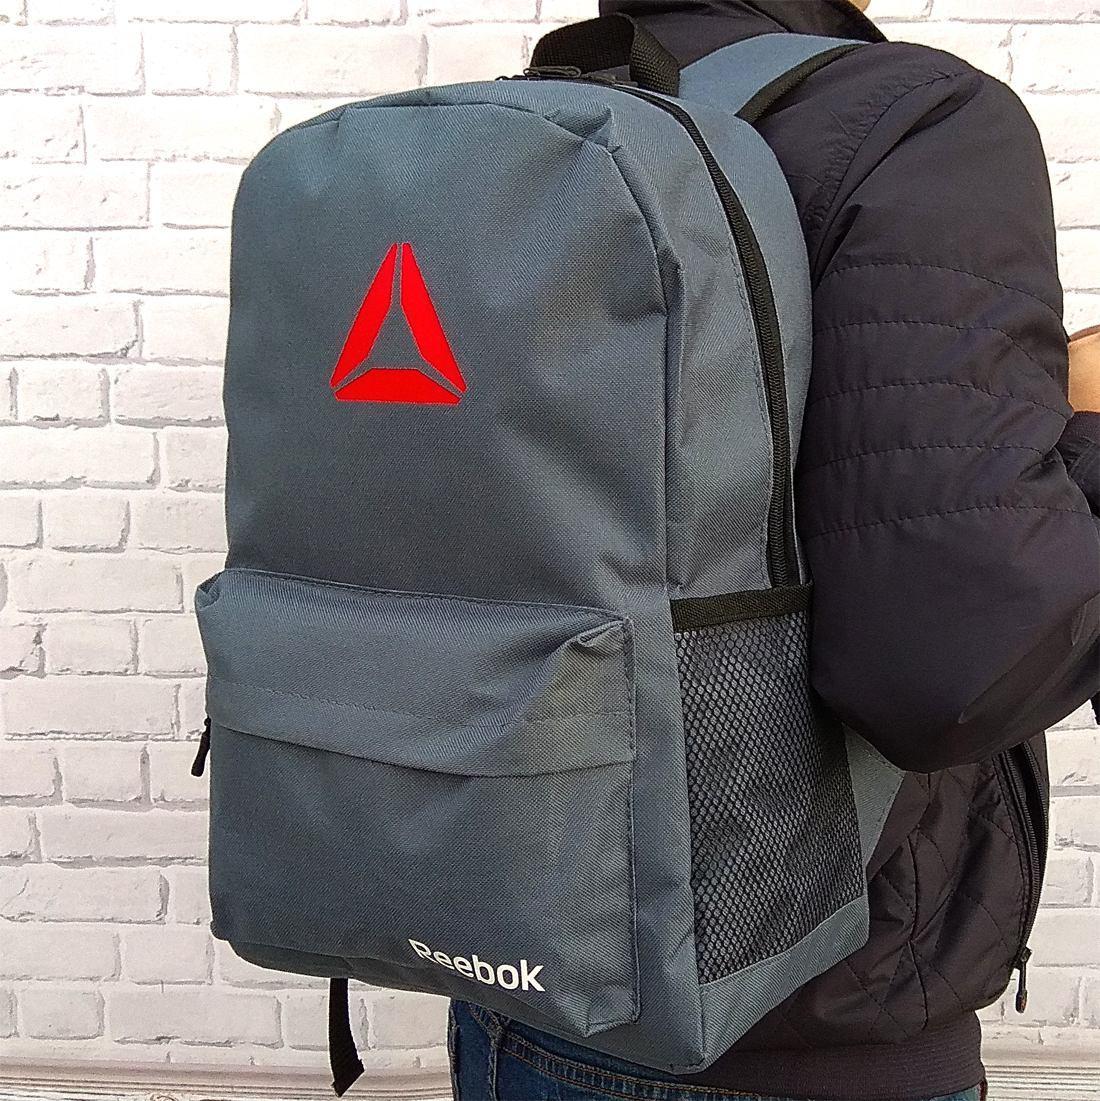 Рюкзак Reebok, рибок. Популярная модель. Серый / R3